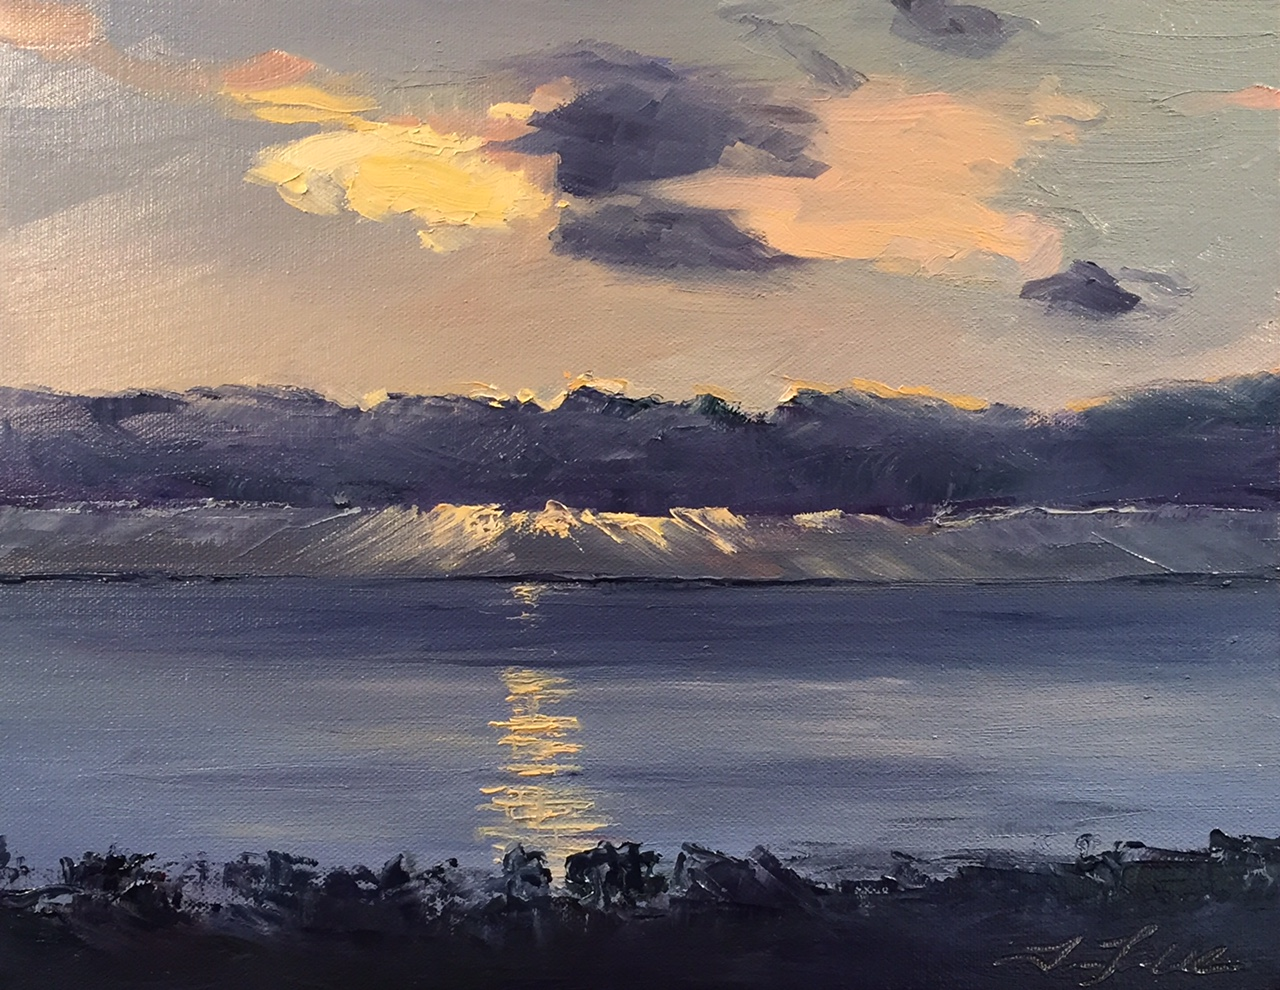 ventura_sunset_14x11